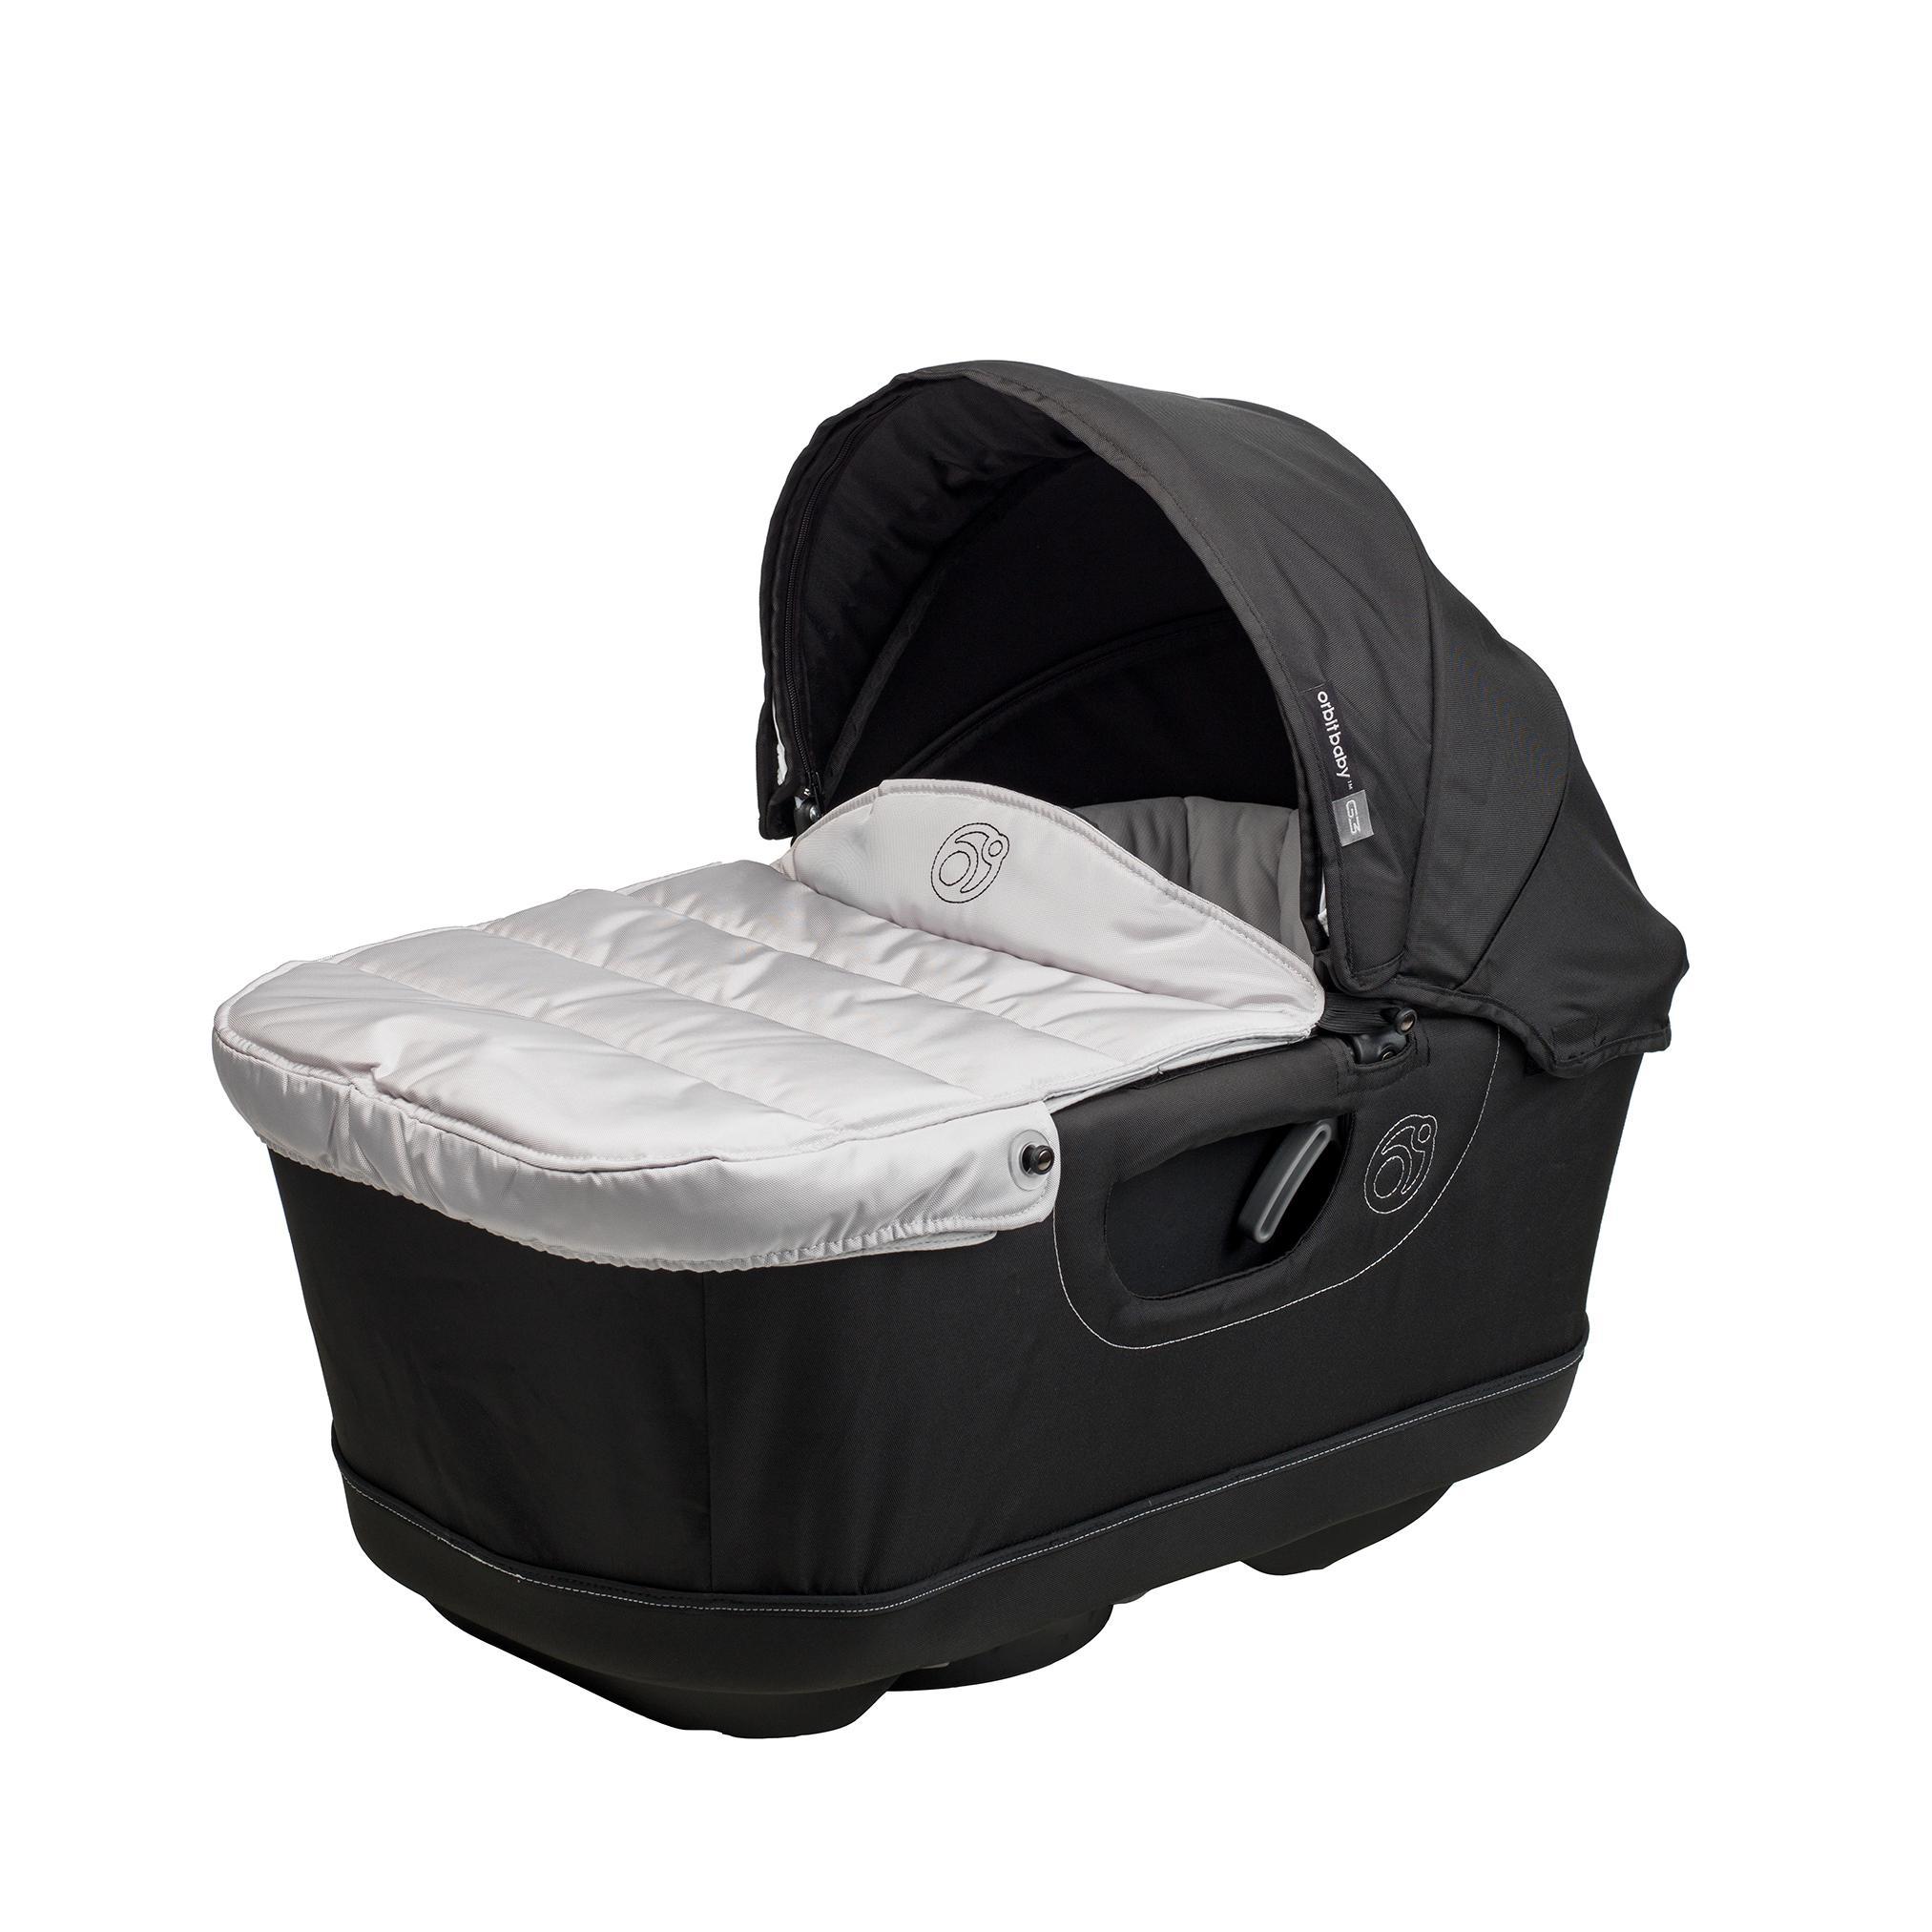 Amazon.com : Orbit Baby G3 Stroller Bassinet, Black : Baby